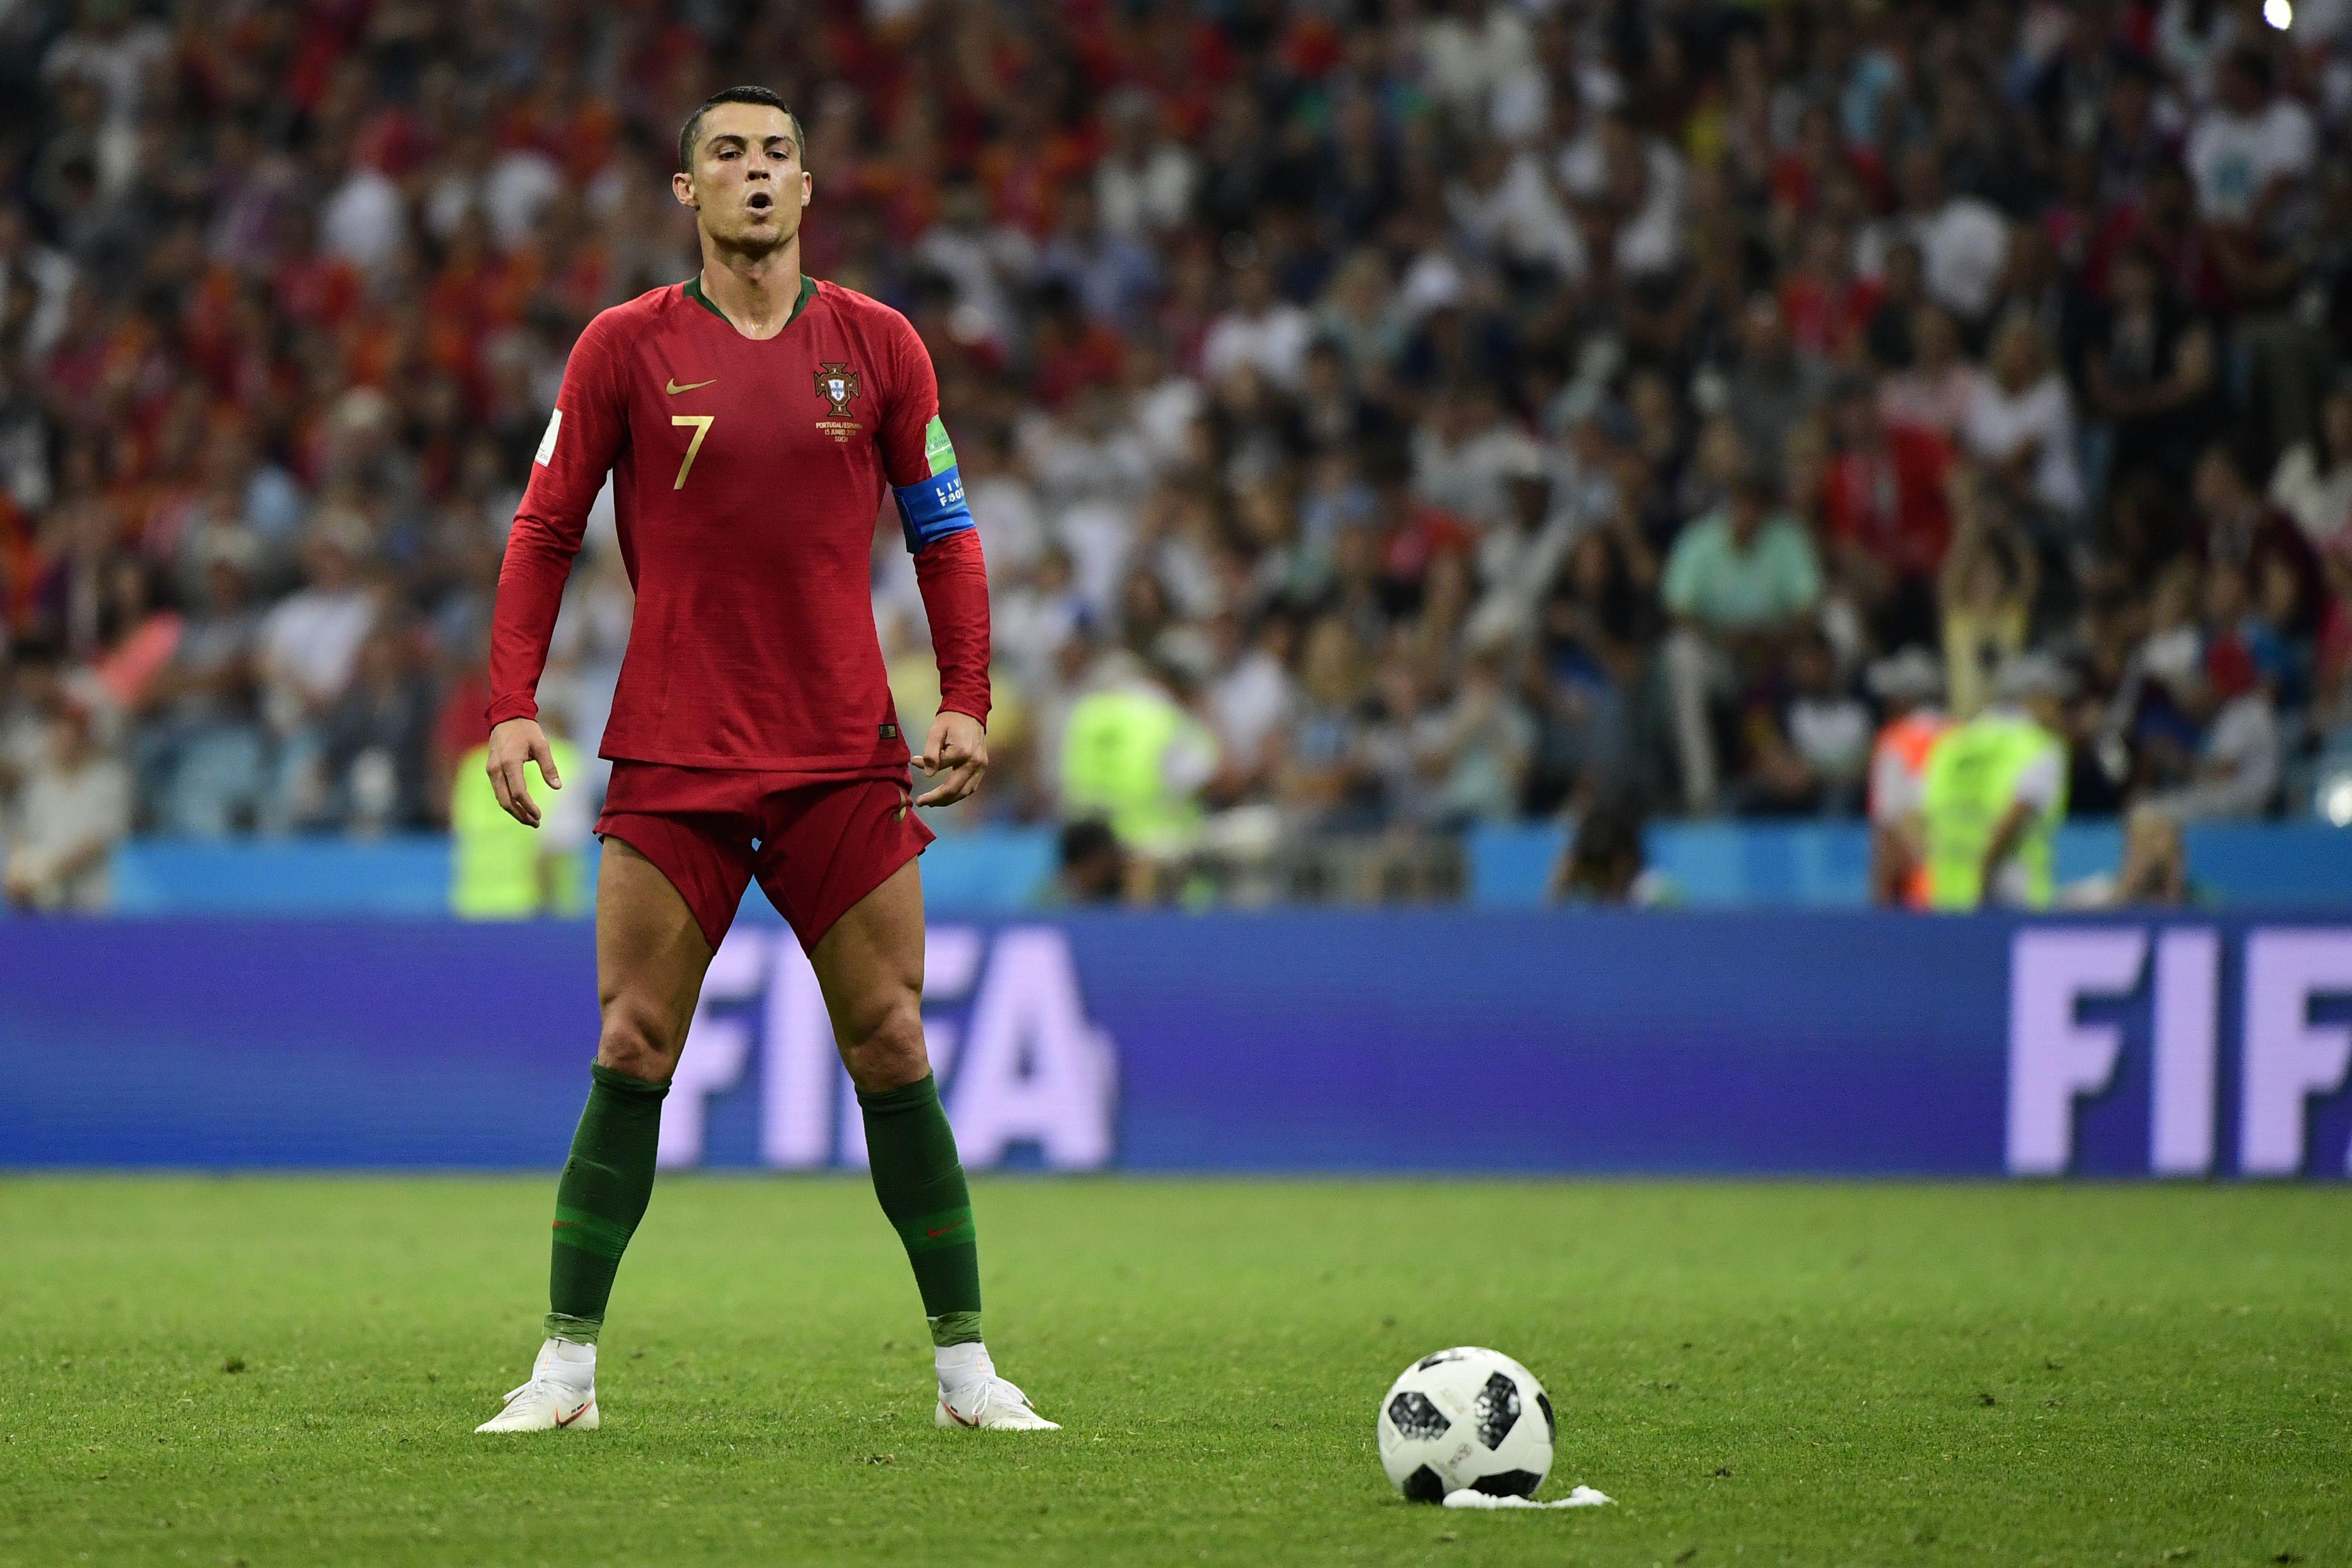 Portugal's forward Cristiano Ronaldo prepares to take a free kick.